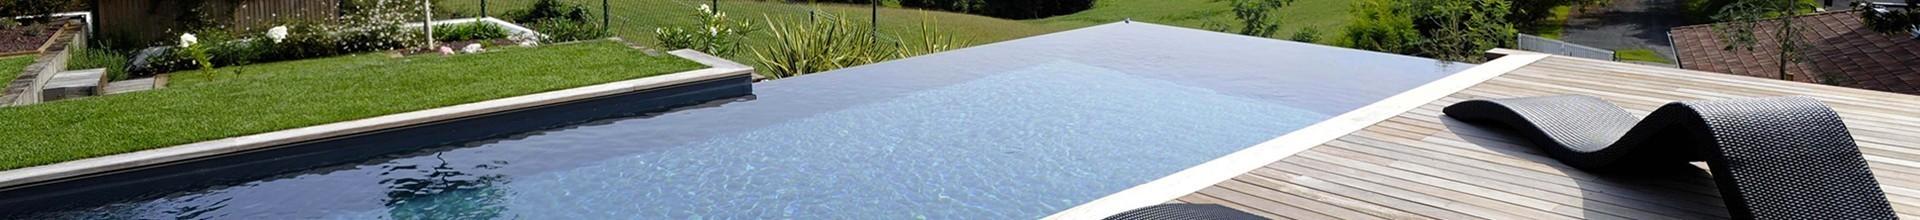 Direct usine, piscine coque prix Centre Val de Loire